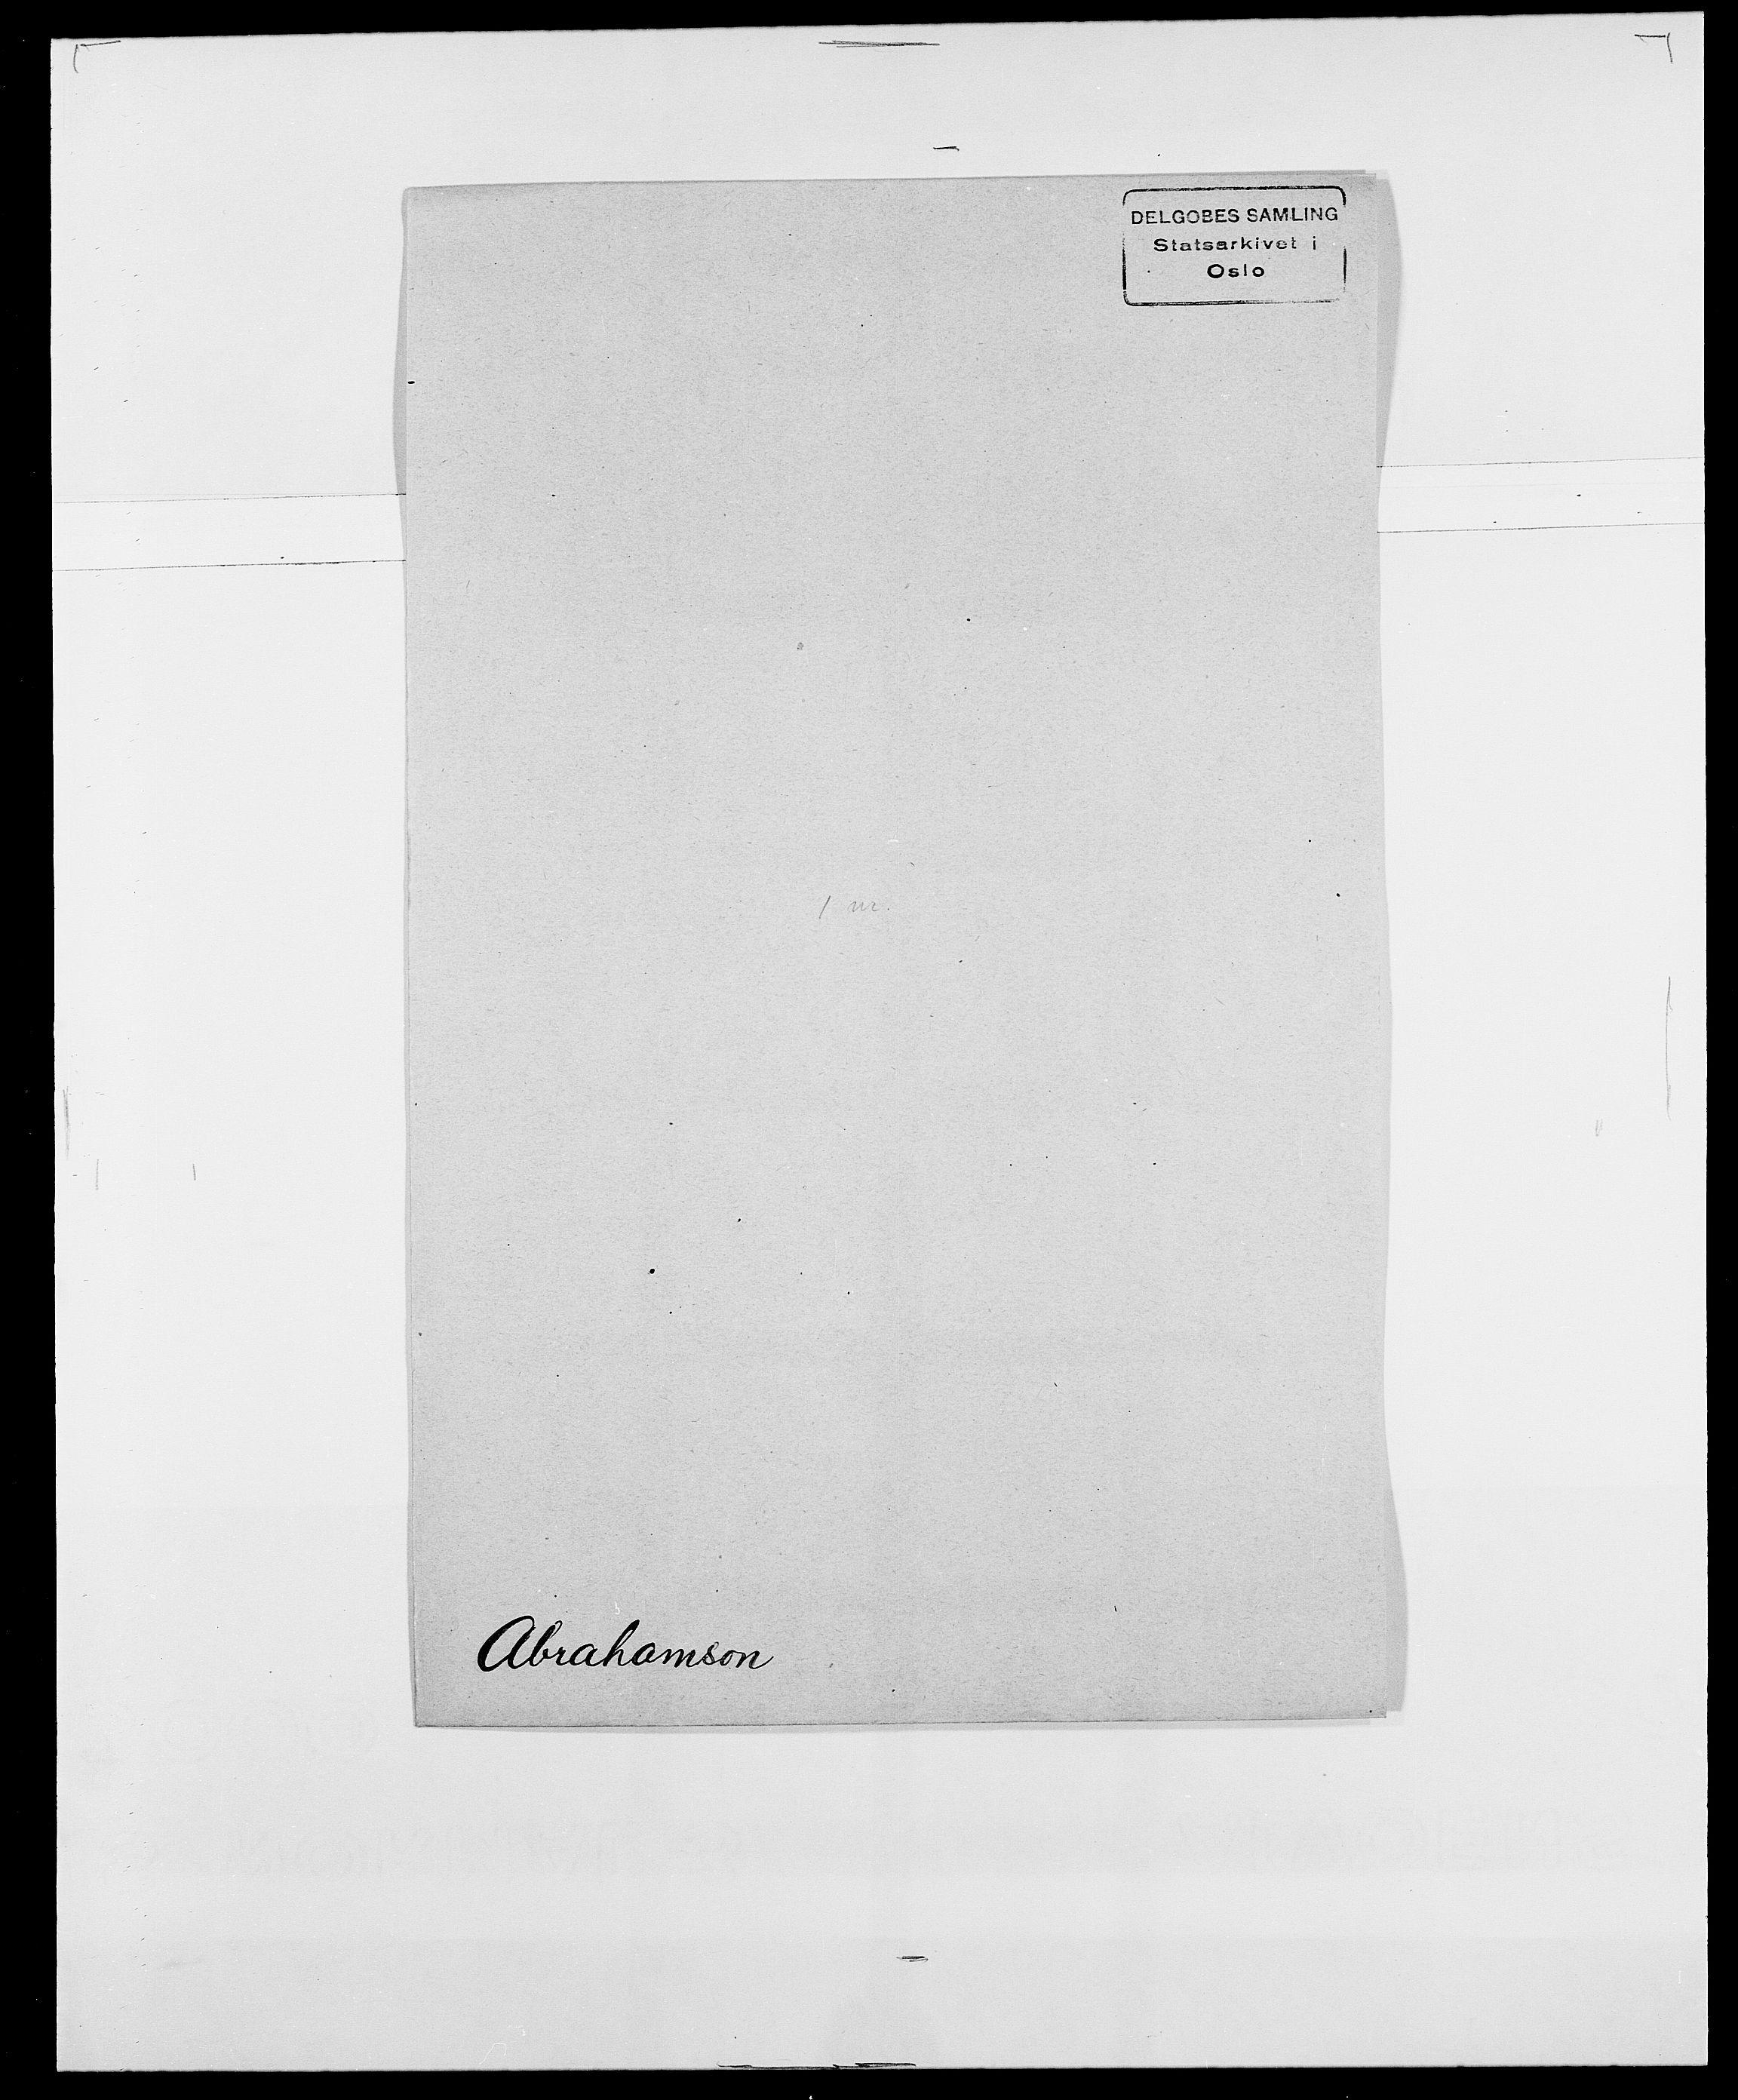 SAO, Delgobe, Charles Antoine - samling, D/Da/L0001: Aabye - Angerman, s. 234